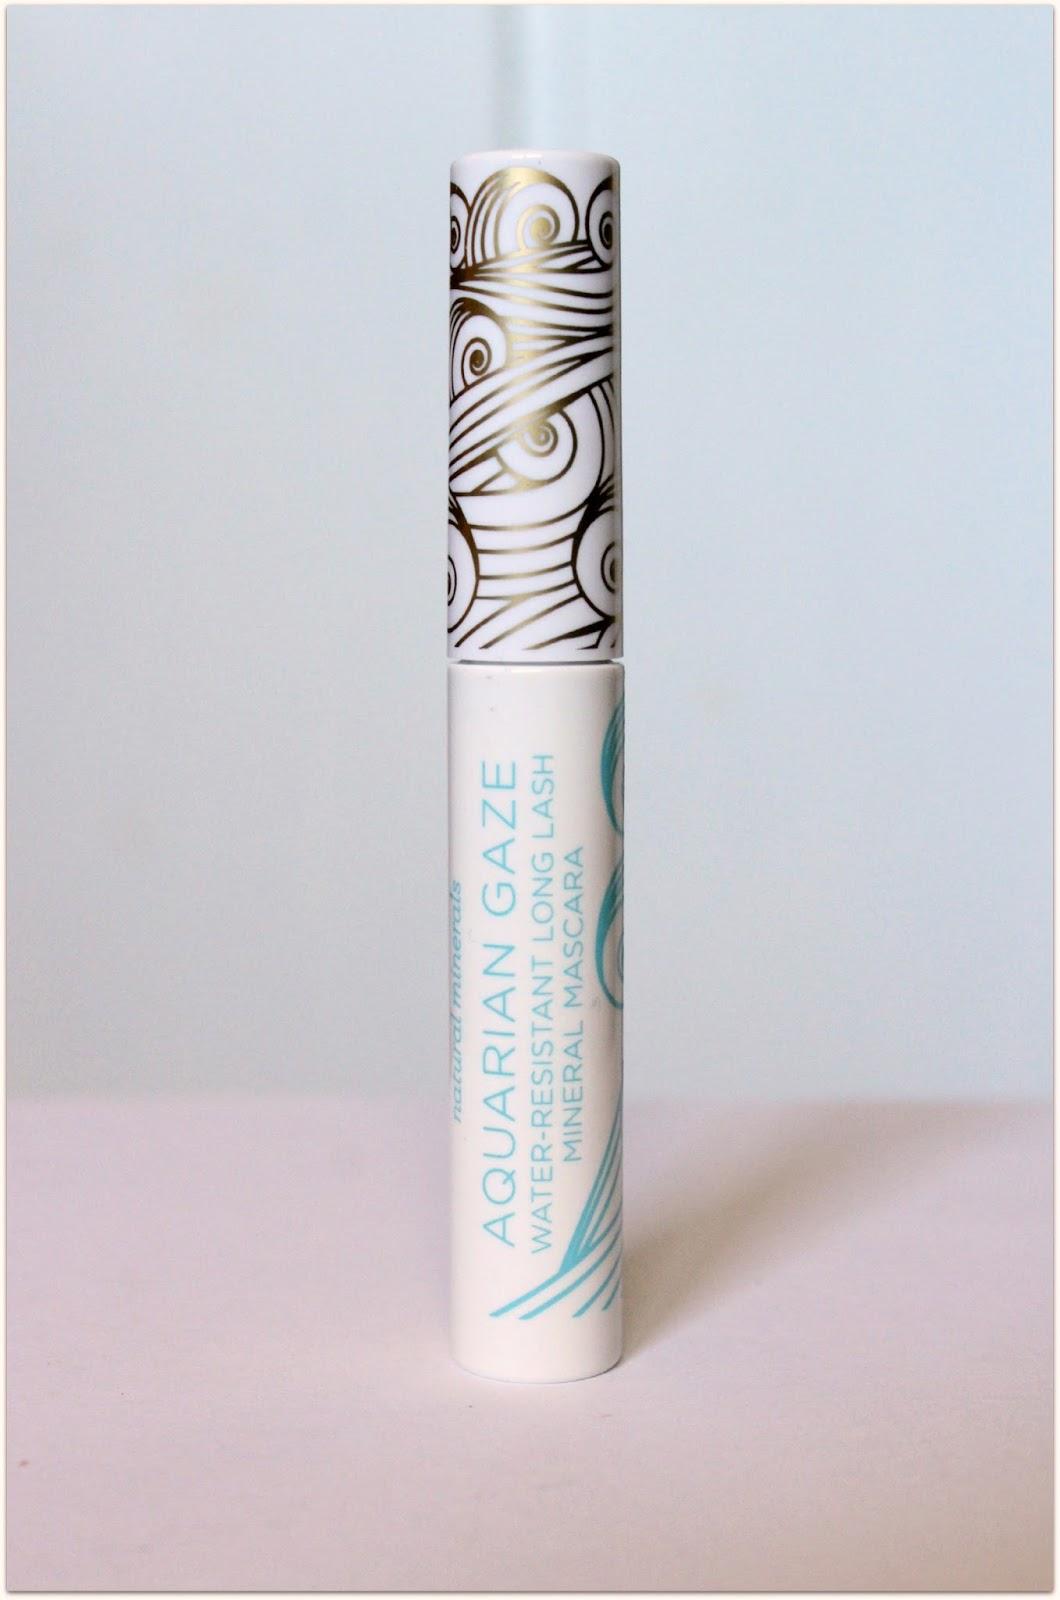 06eddef883f Review: Pacifica Aquarian Gaze Water-Resistant Long Lash Mineral Mascara